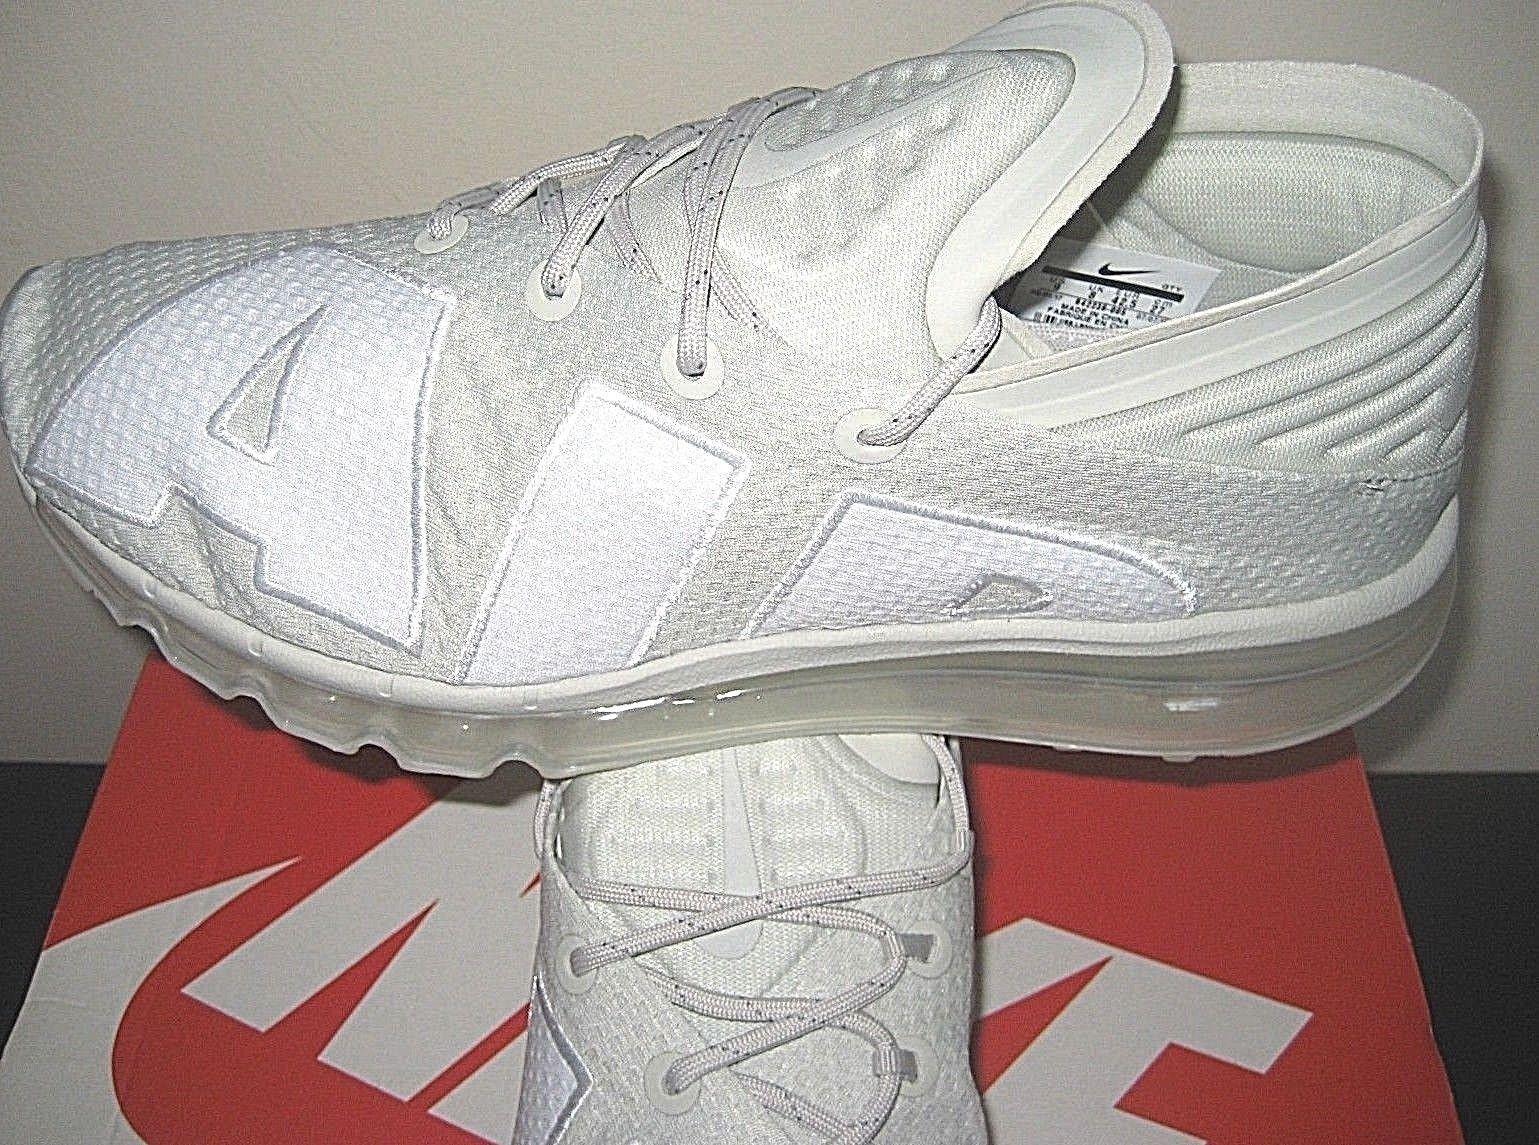 e917ea808f46 Nike Mens Air Max Flair Running Shoes Light Bone White Cool Grey Size 9 New